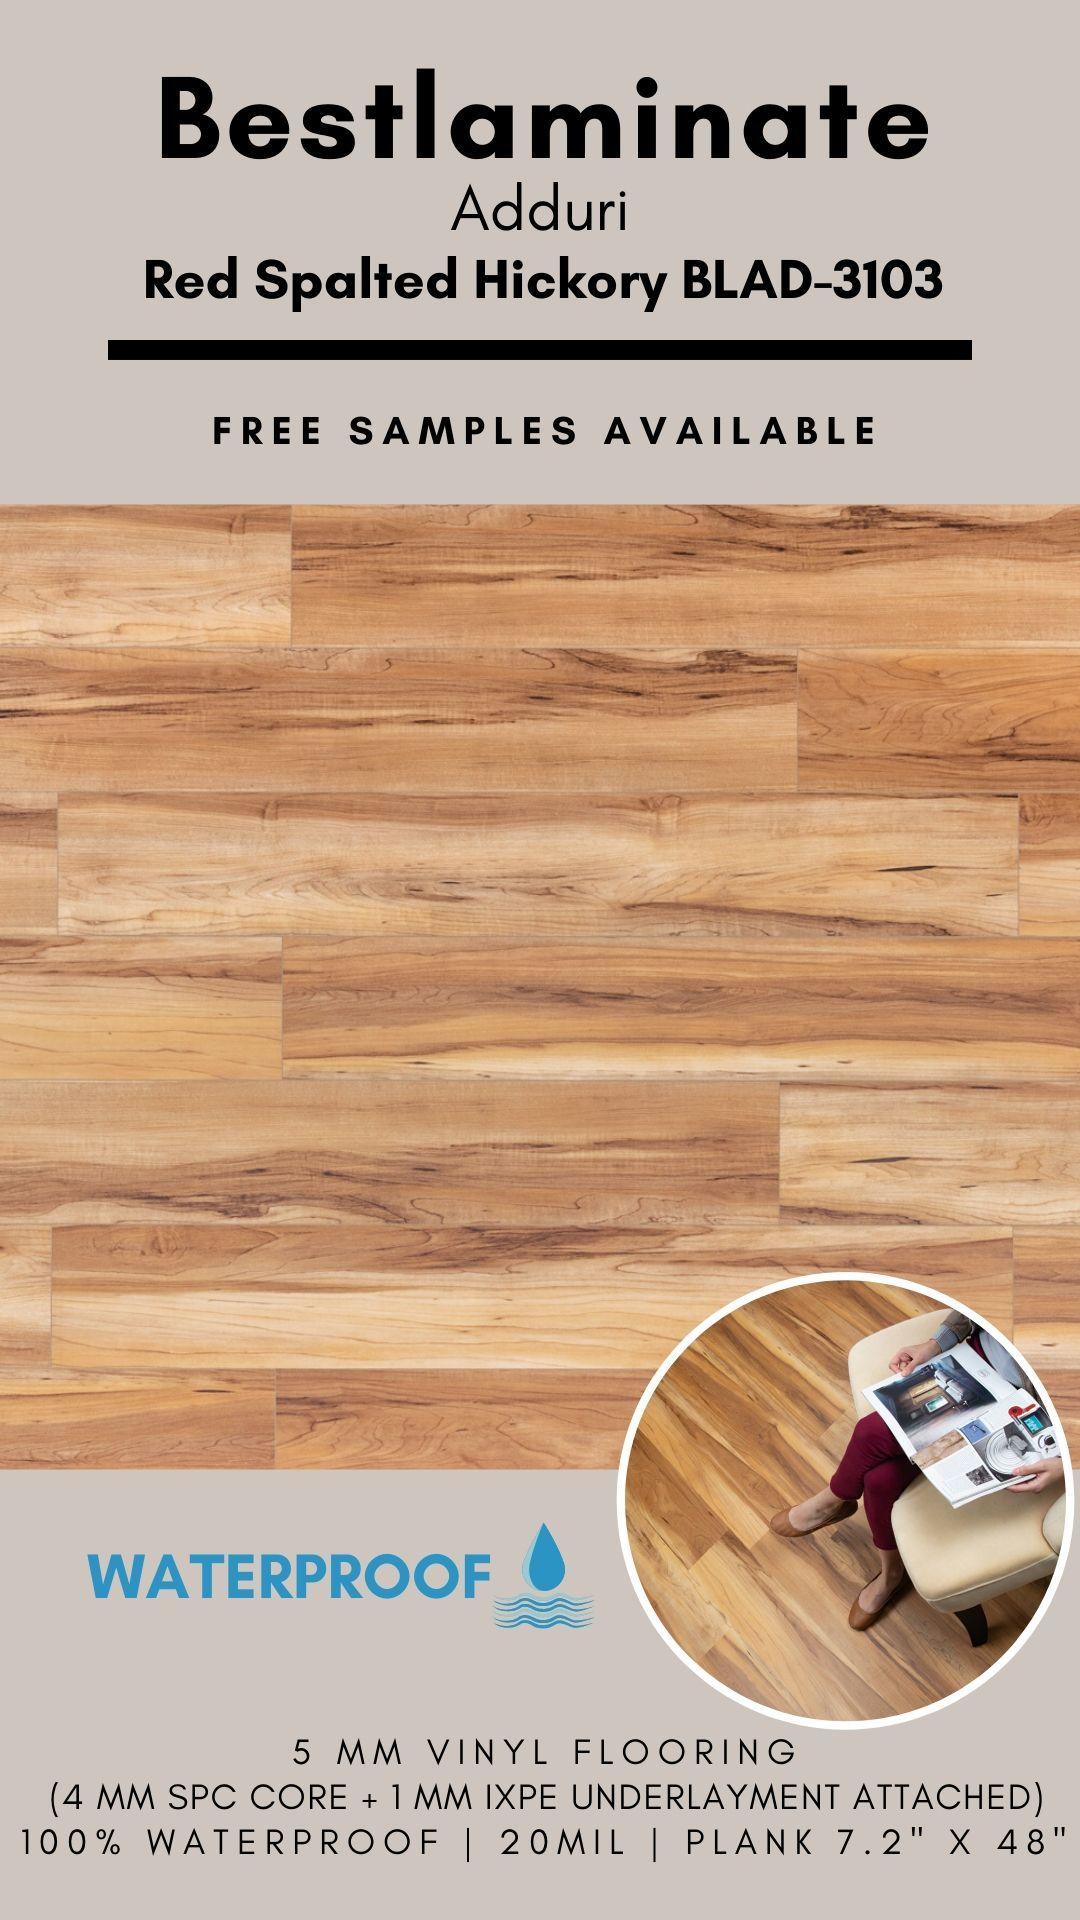 Bestlaminate Adduri Red Spalted Hickory Blad 3103 Luxury Spc Vinyl Flooring In 2020 Vinyl Flooring Vinyl Plank Flooring Luxury Vinyl Plank Flooring